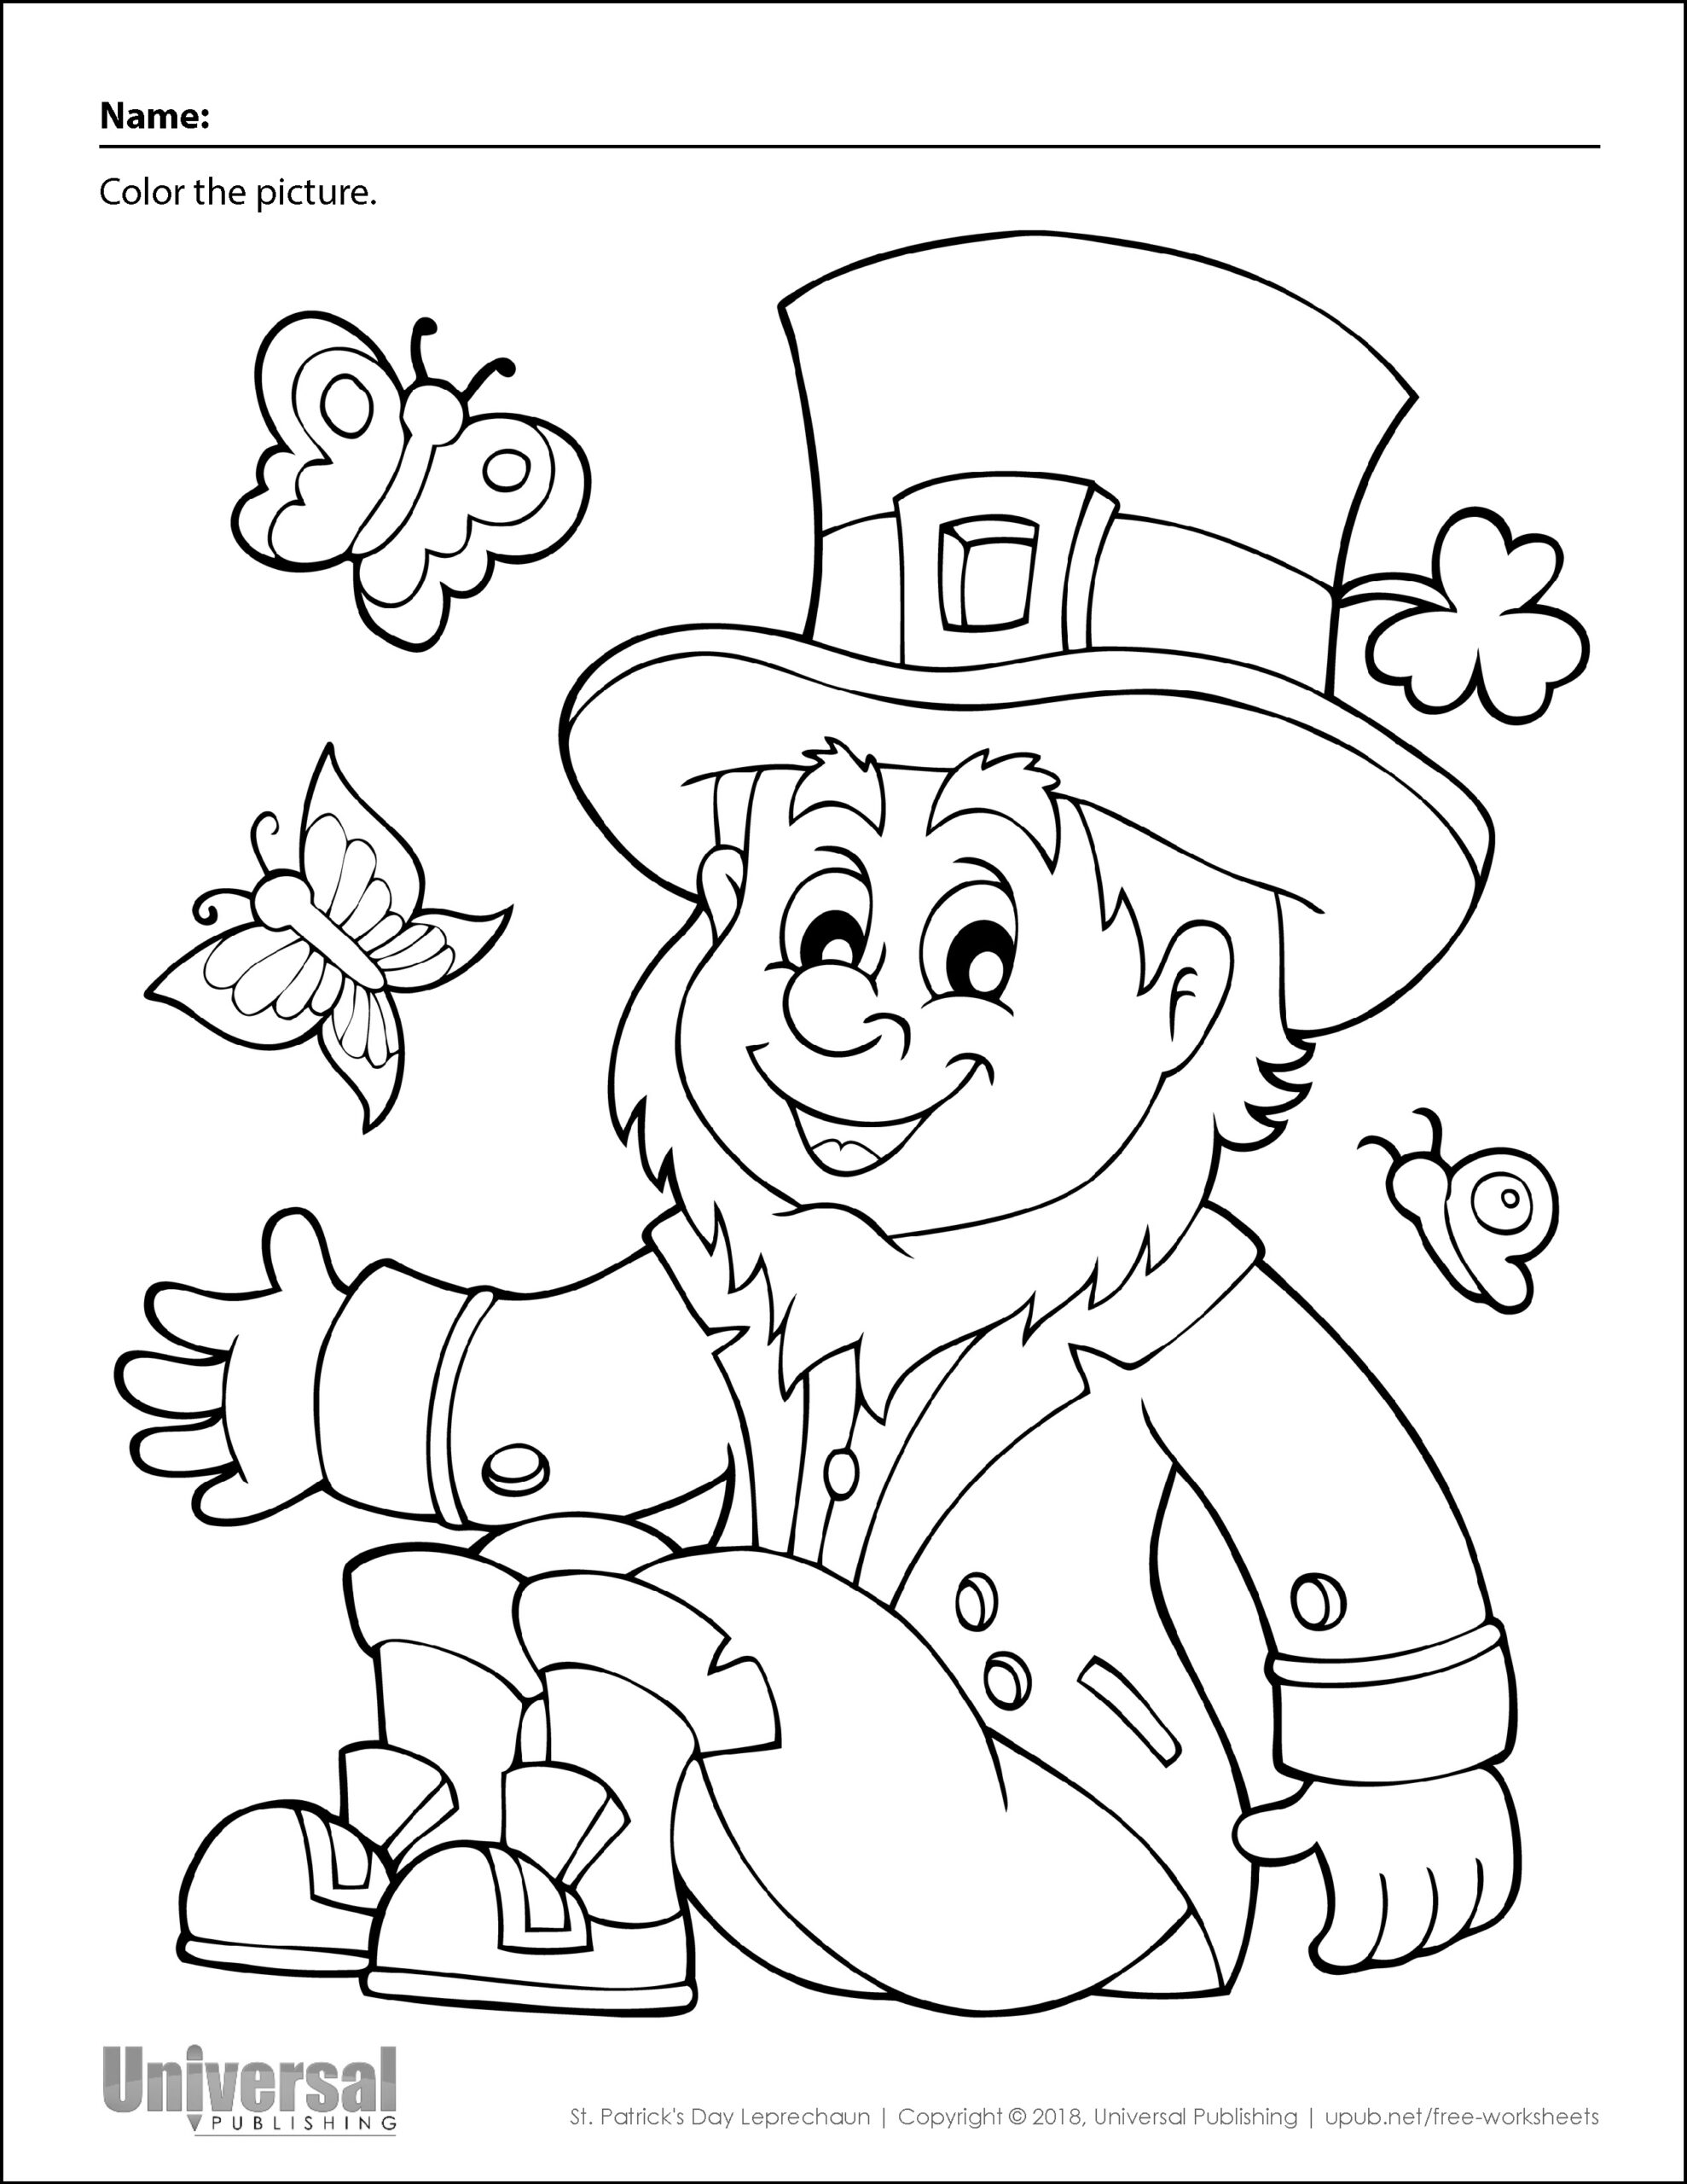 St. Patrick's Day | Free Printables - Universal Publishing Blog